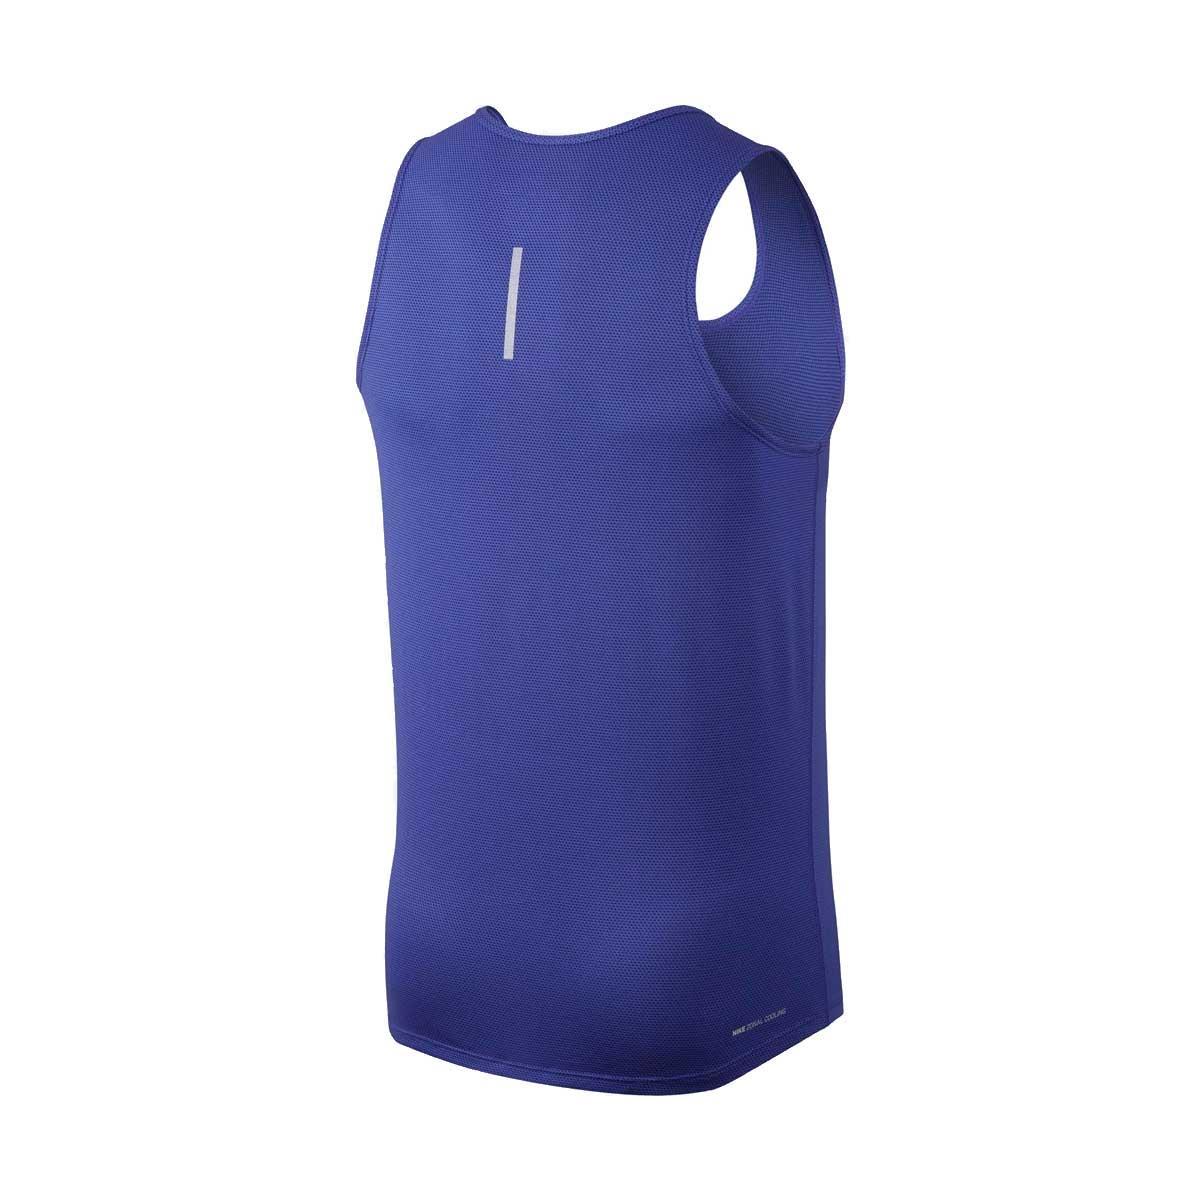 Camiseta Regata Nike Zonal Cool Relay Masculino 67bbdc6048a